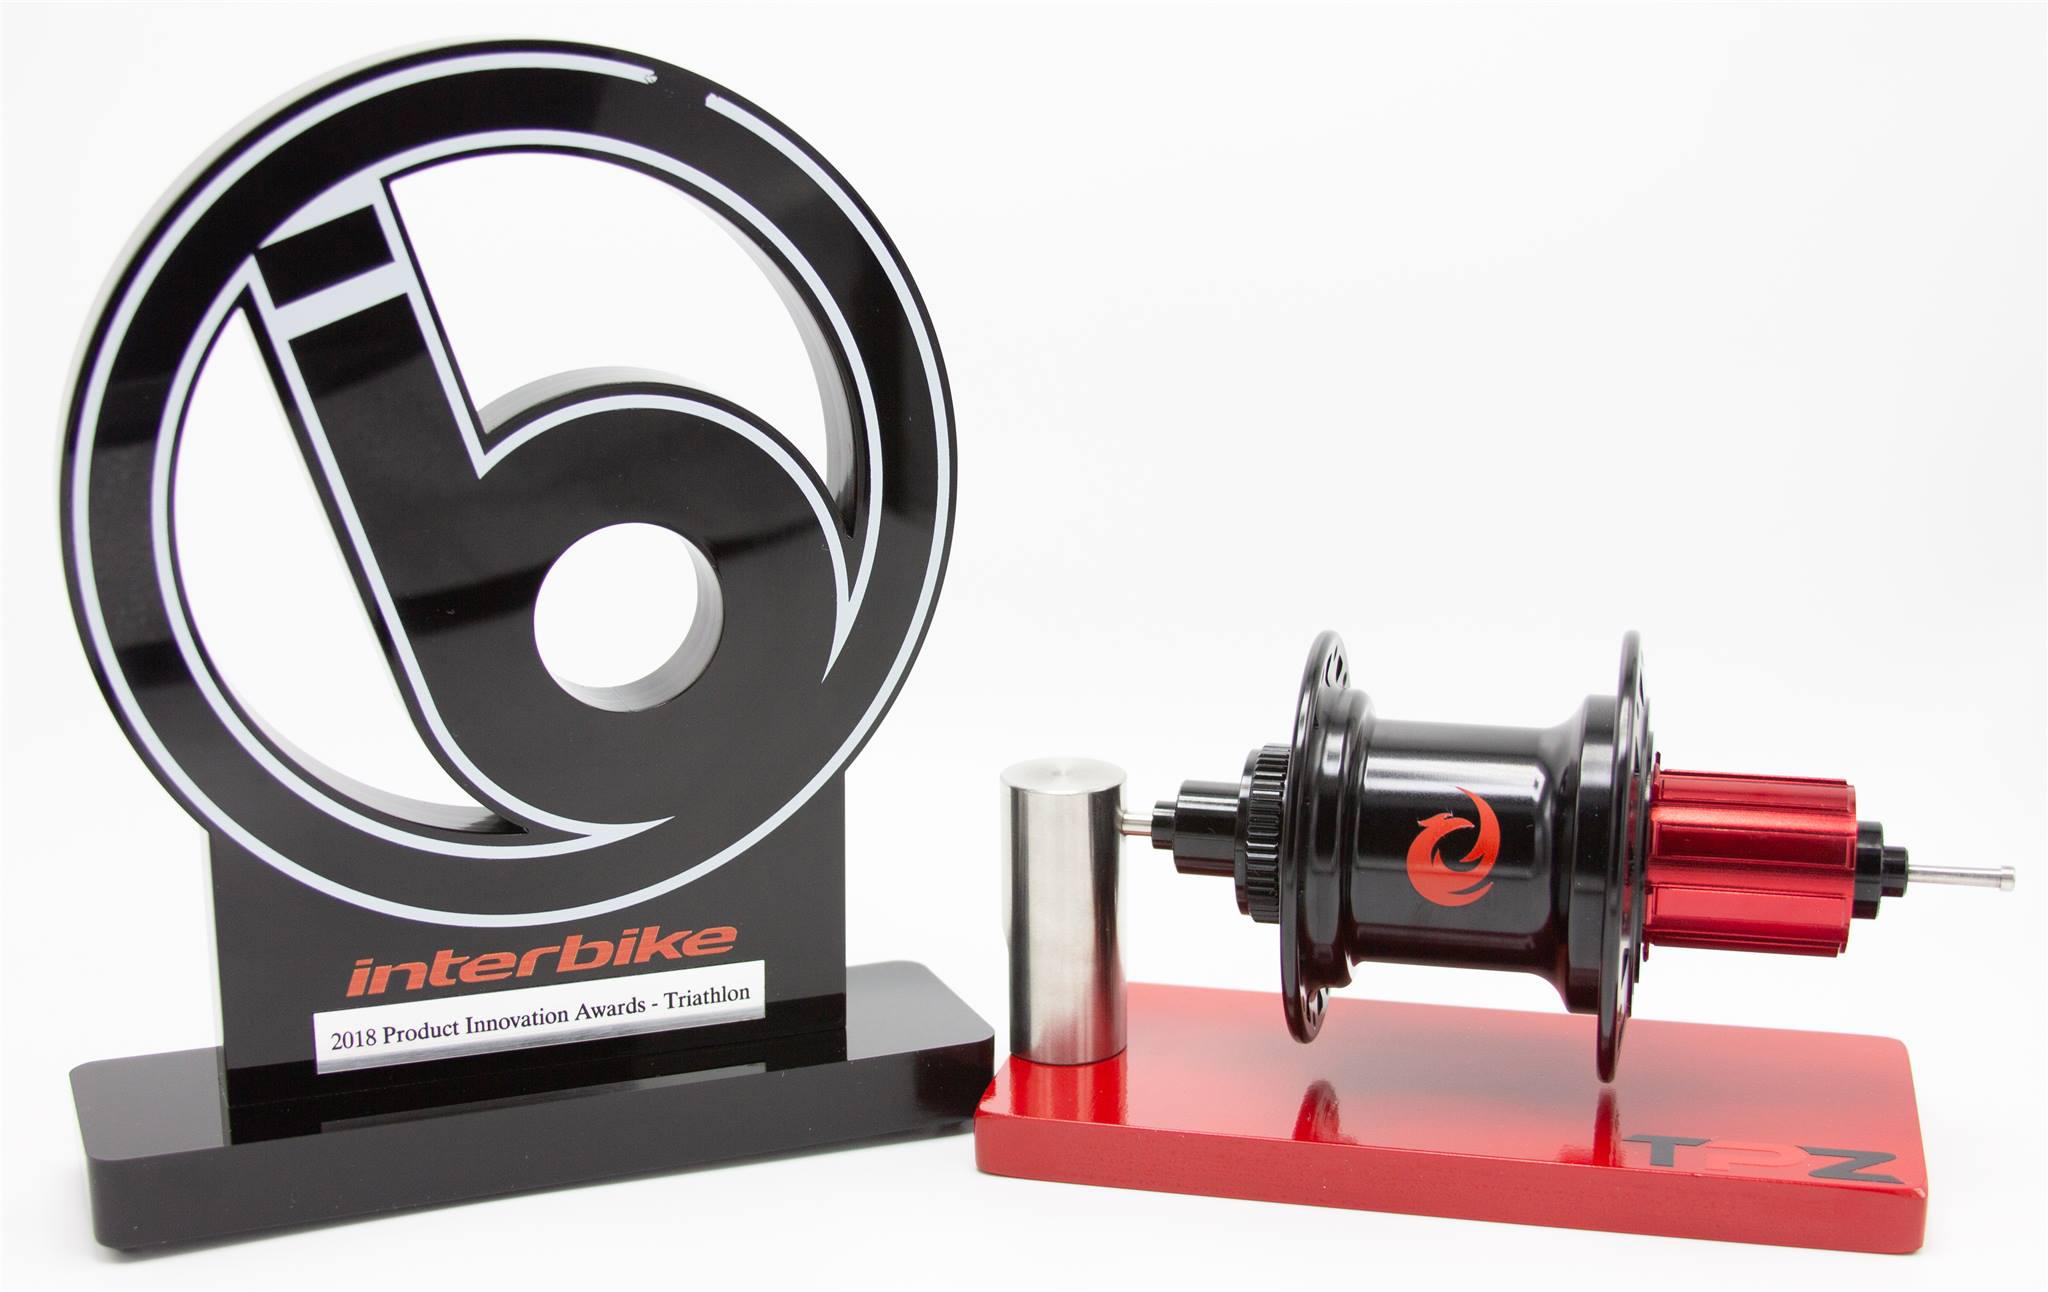 interbike-award-2018.jpg